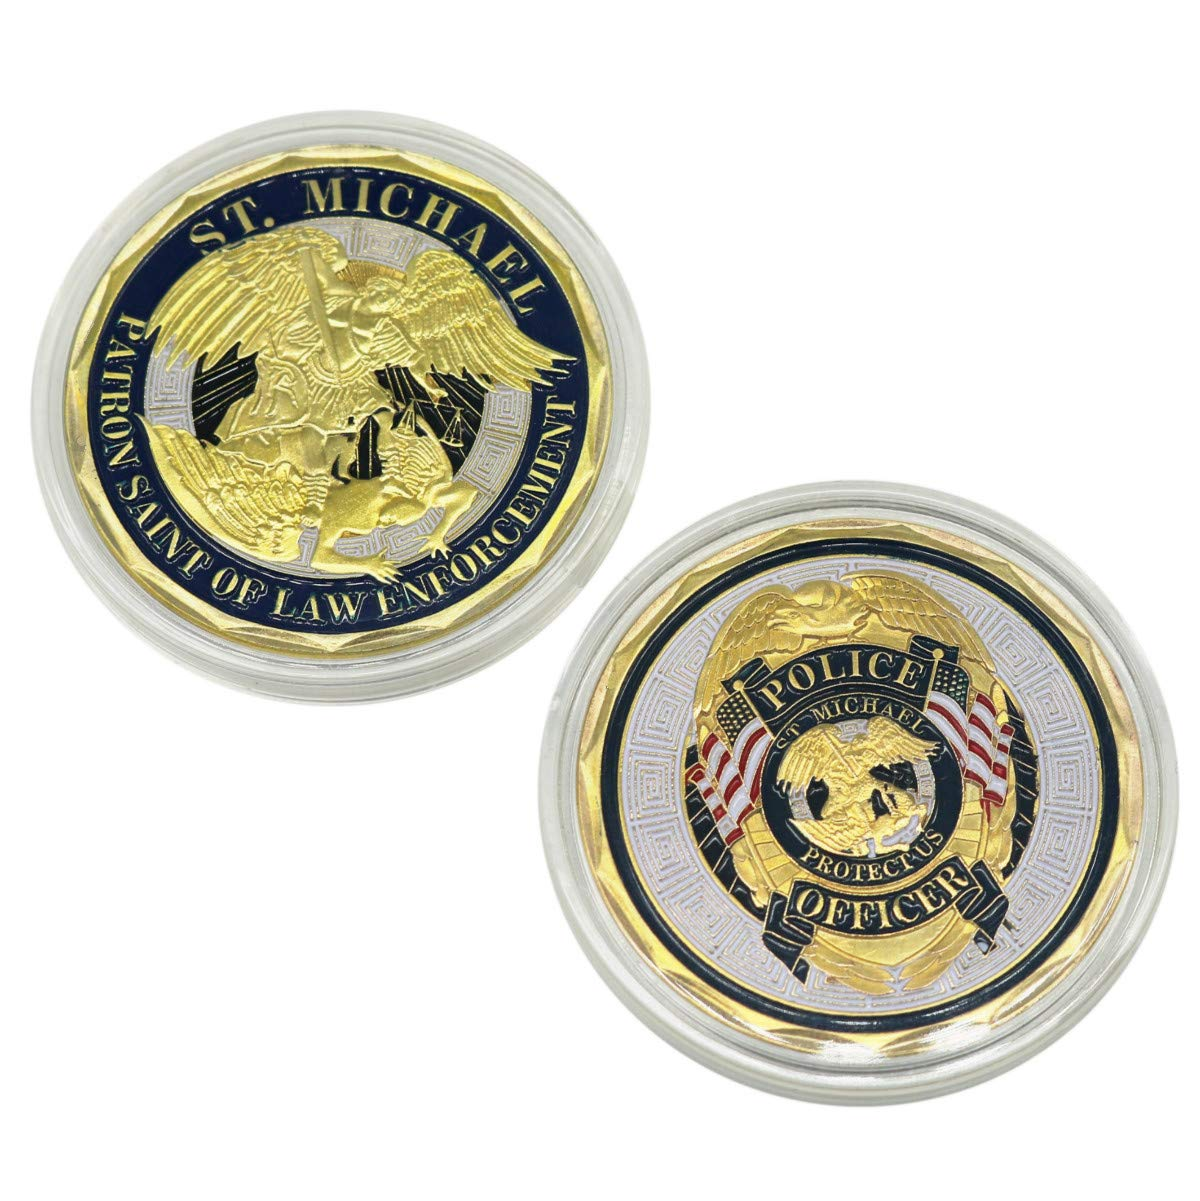 Michael Police Officers Challenge Coin,Patron Saint of Law Enforcement Prayer Coins HS St